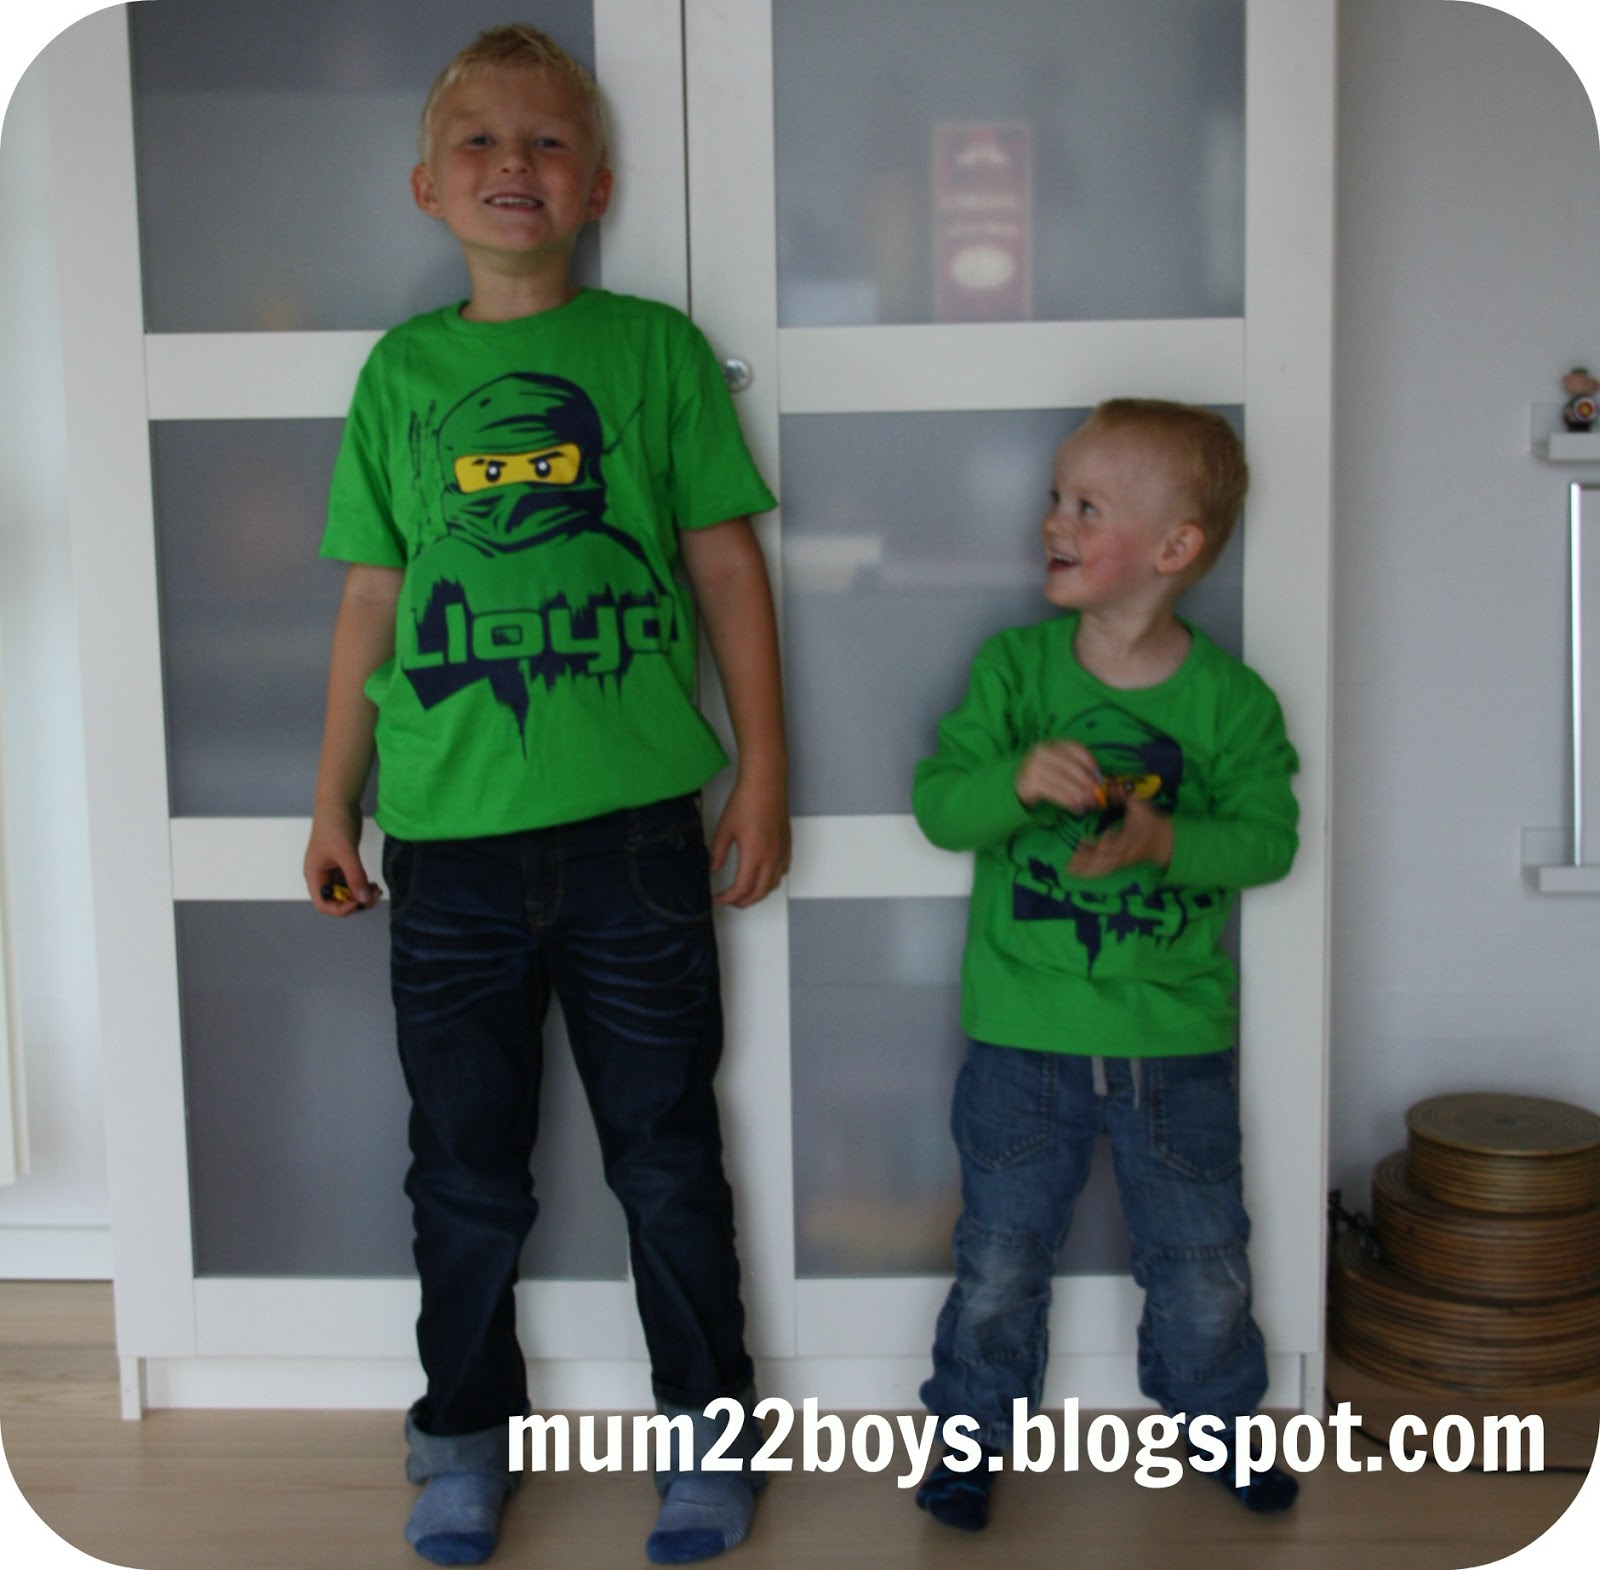 Mum 2 2 boys: august 2013